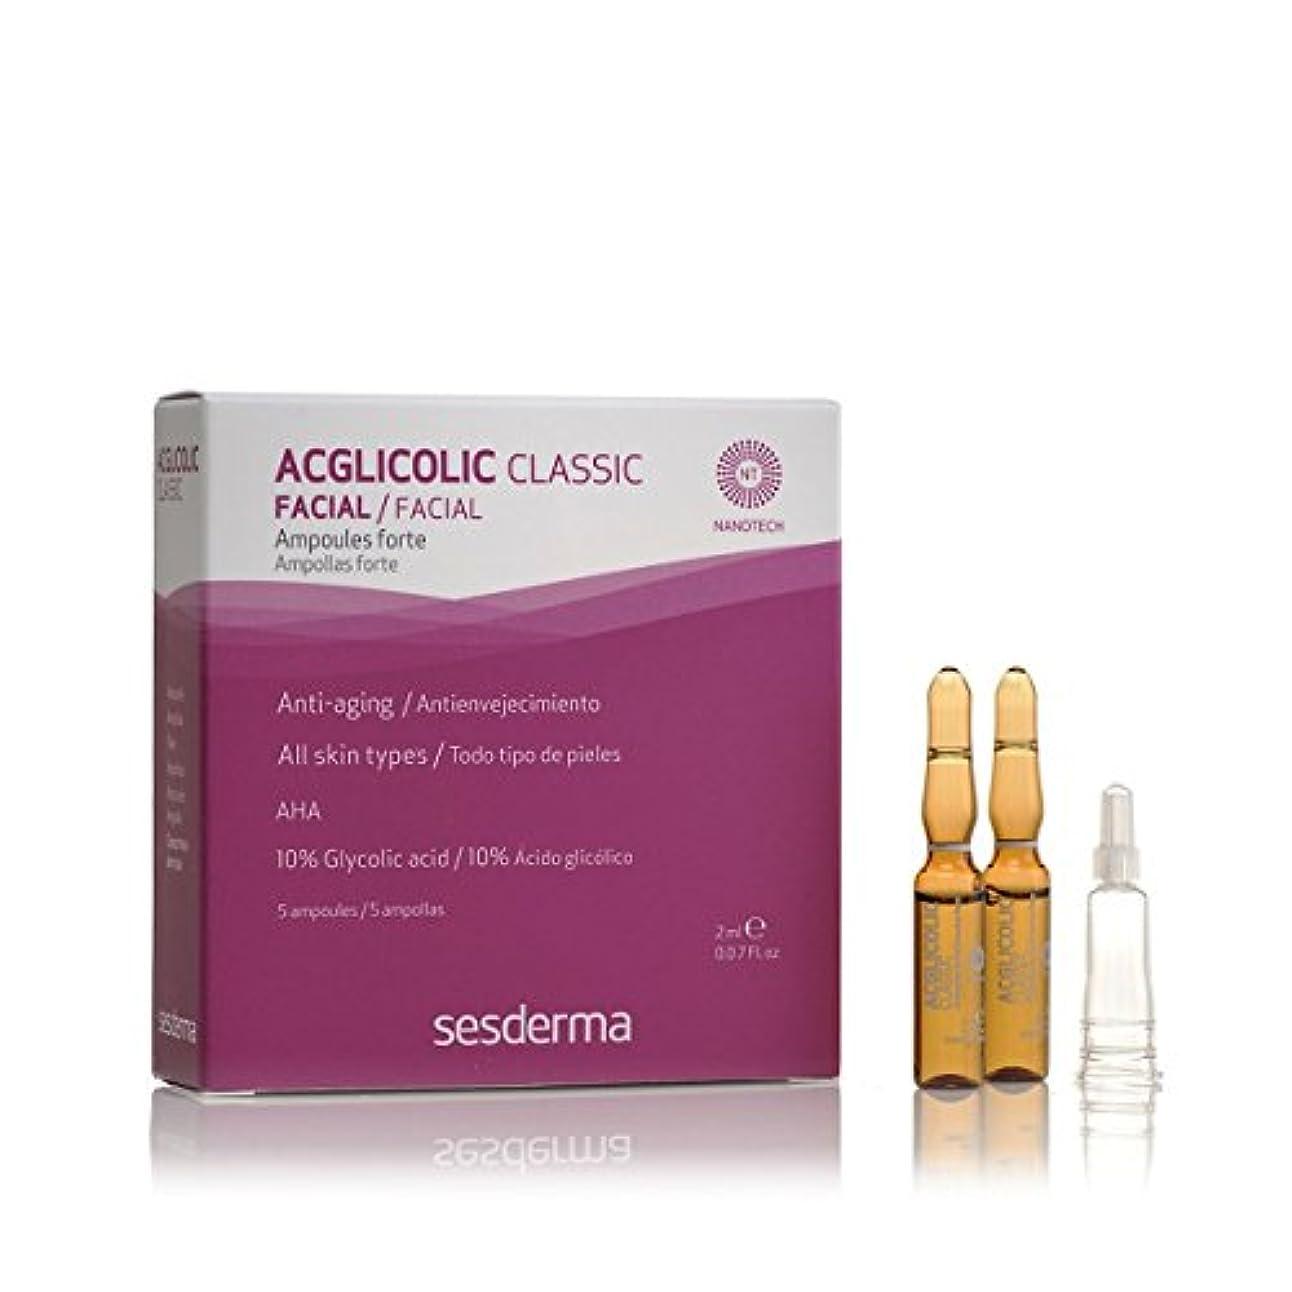 人差し指寸前正直Sesderma Acglicolic Classic Antiaging Ampoules 5x2ml [並行輸入品]